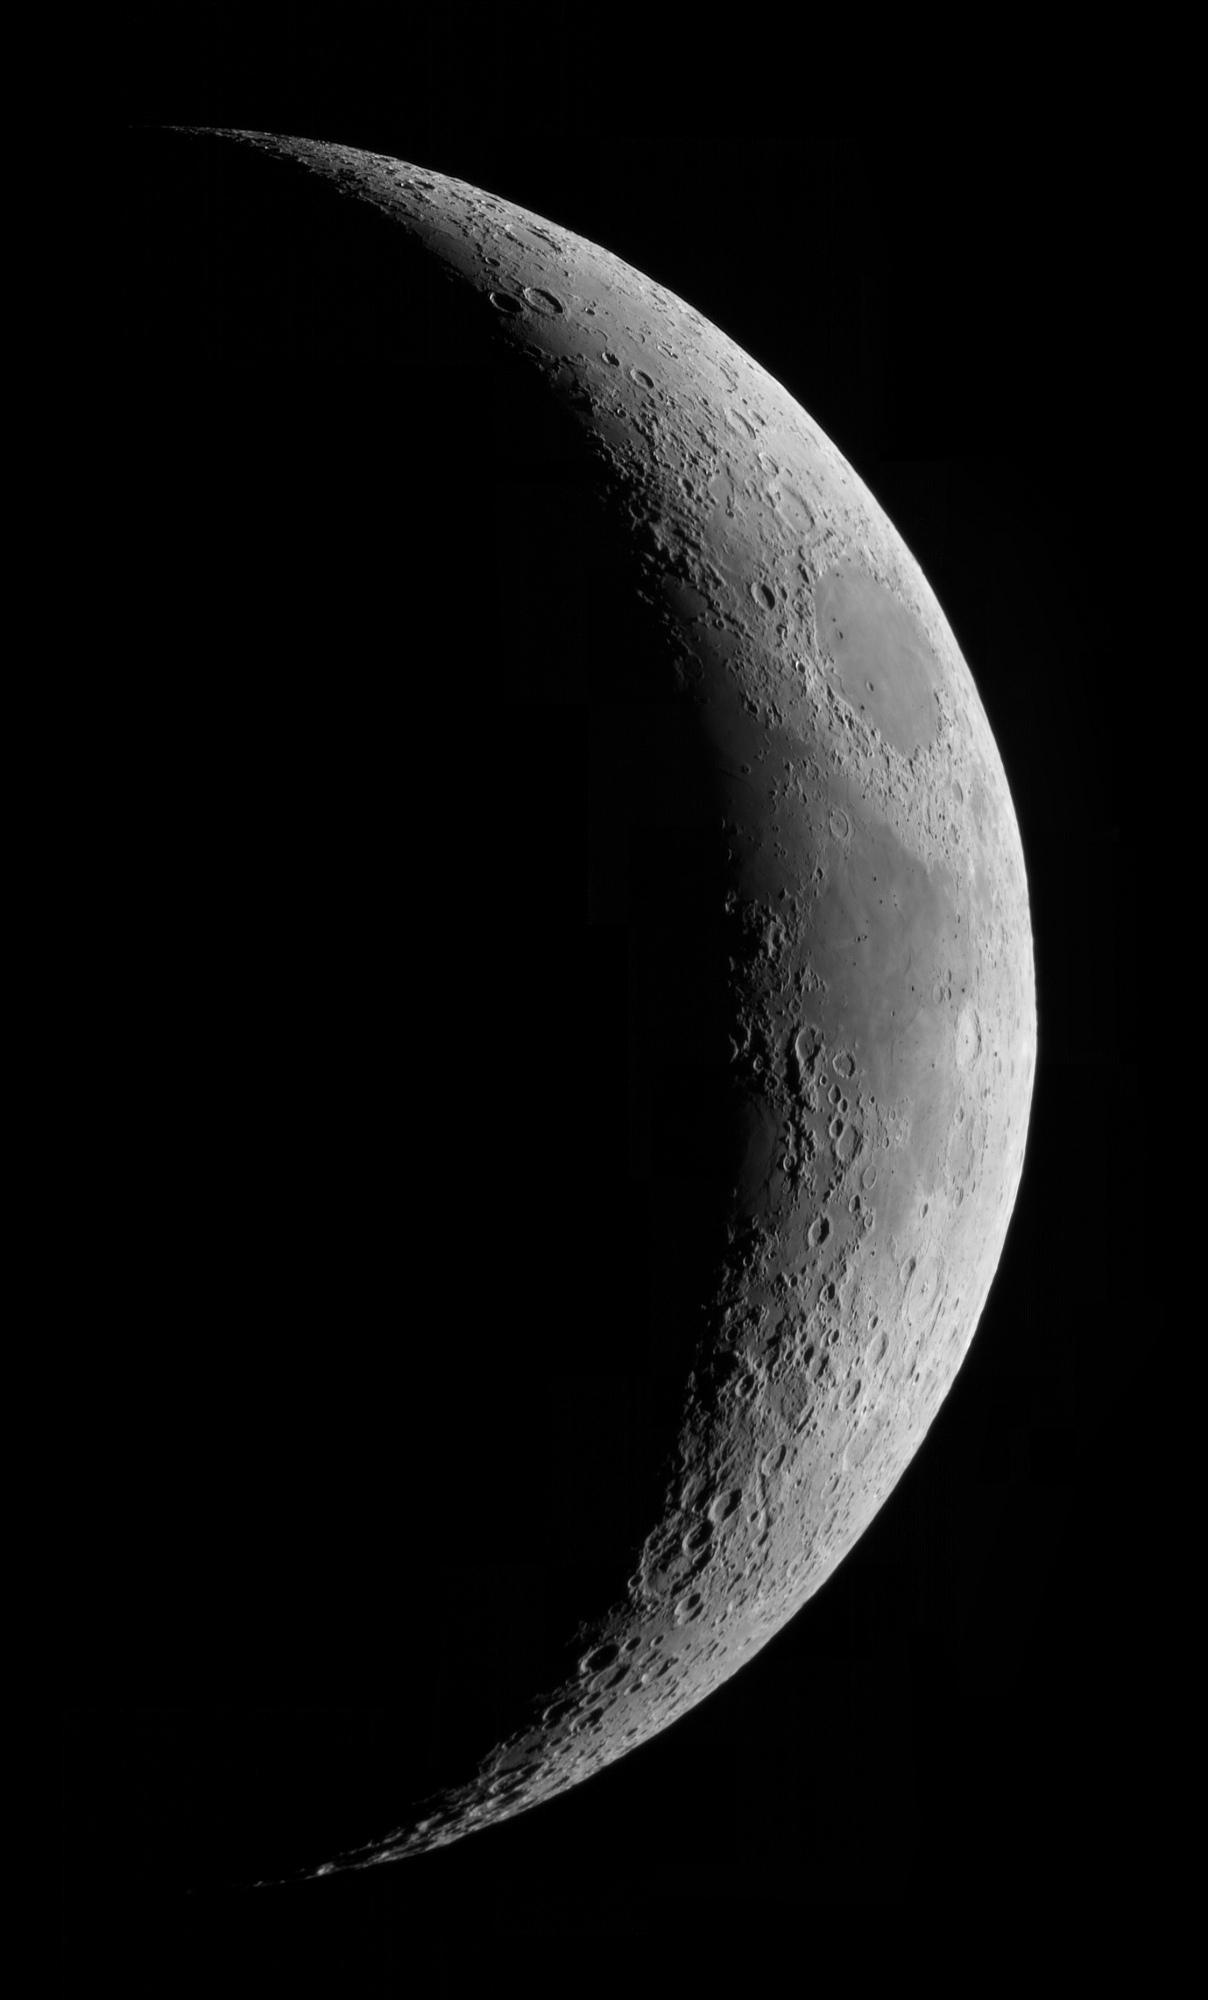 5ed03ddbb9108_lune260520(70).thumb.jpg.0d9f85a688262134b11e031536168d6c.jpg